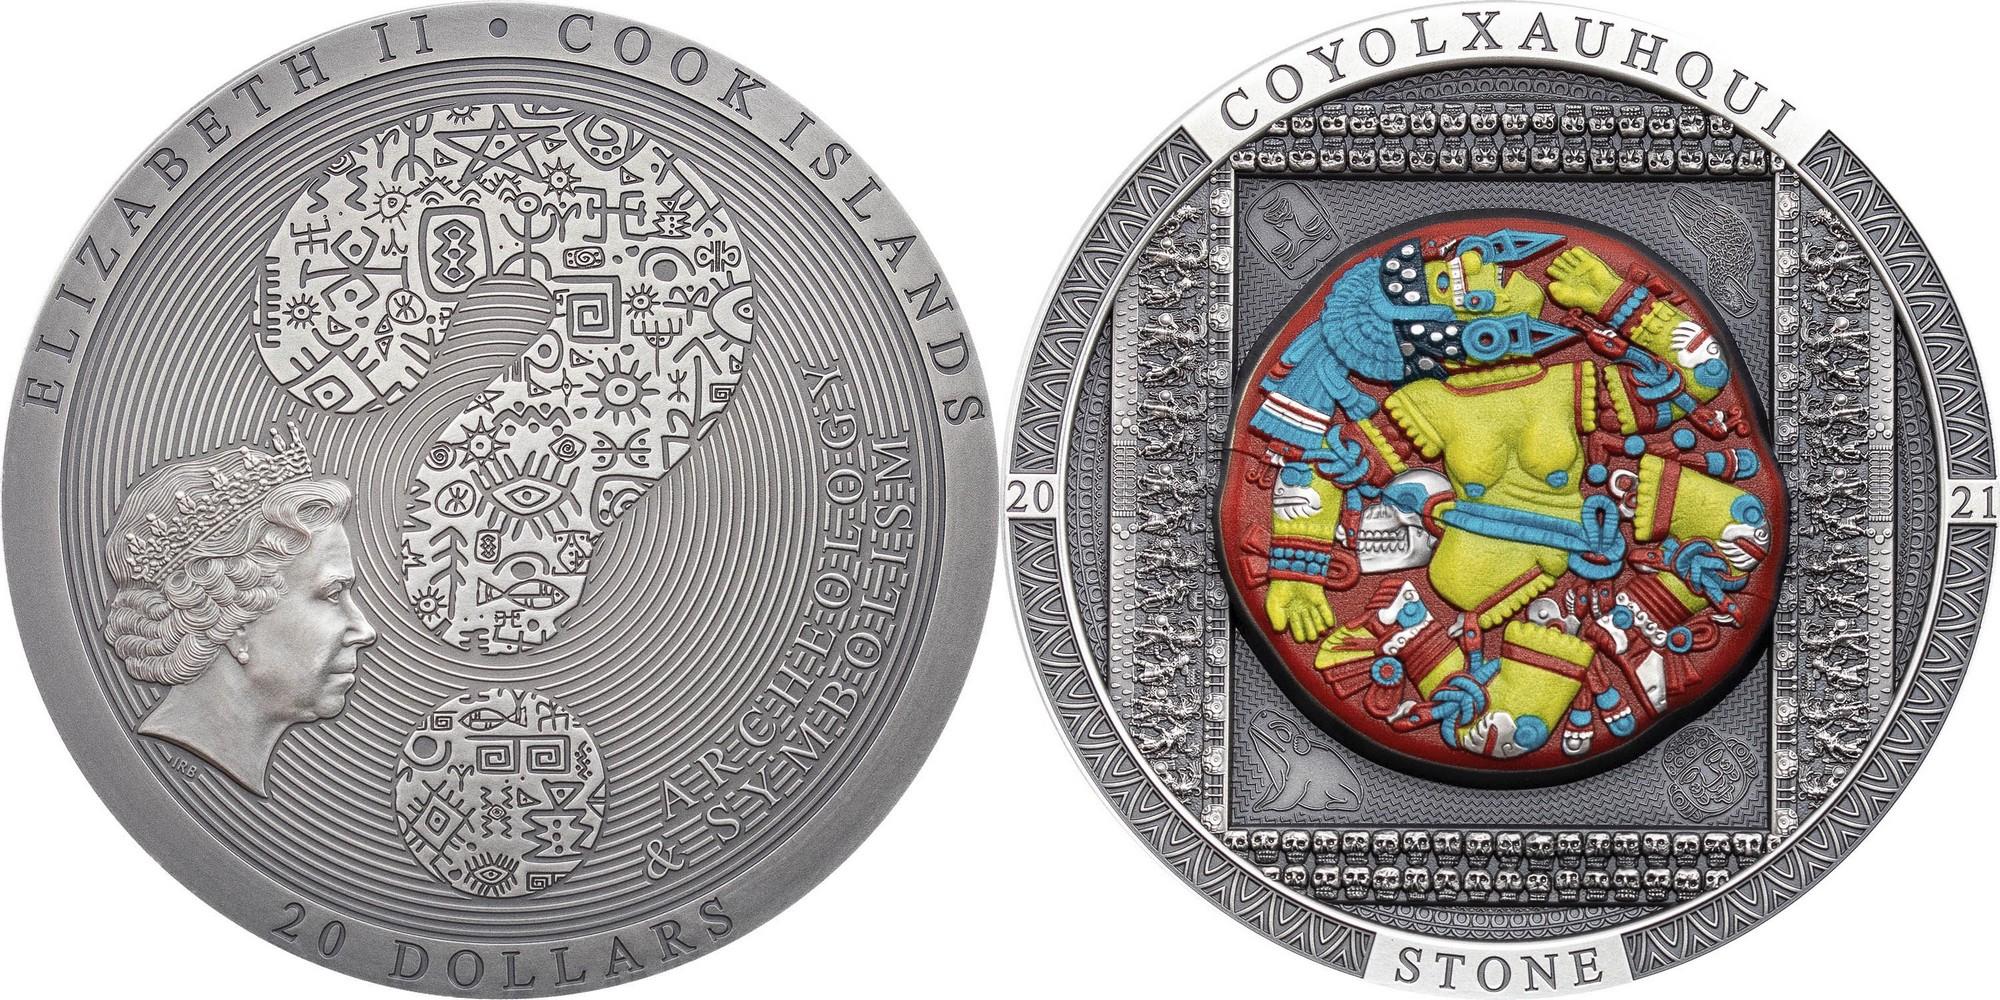 cook-isl-2021-pierre-azteque-coyolxauhqui-couleur